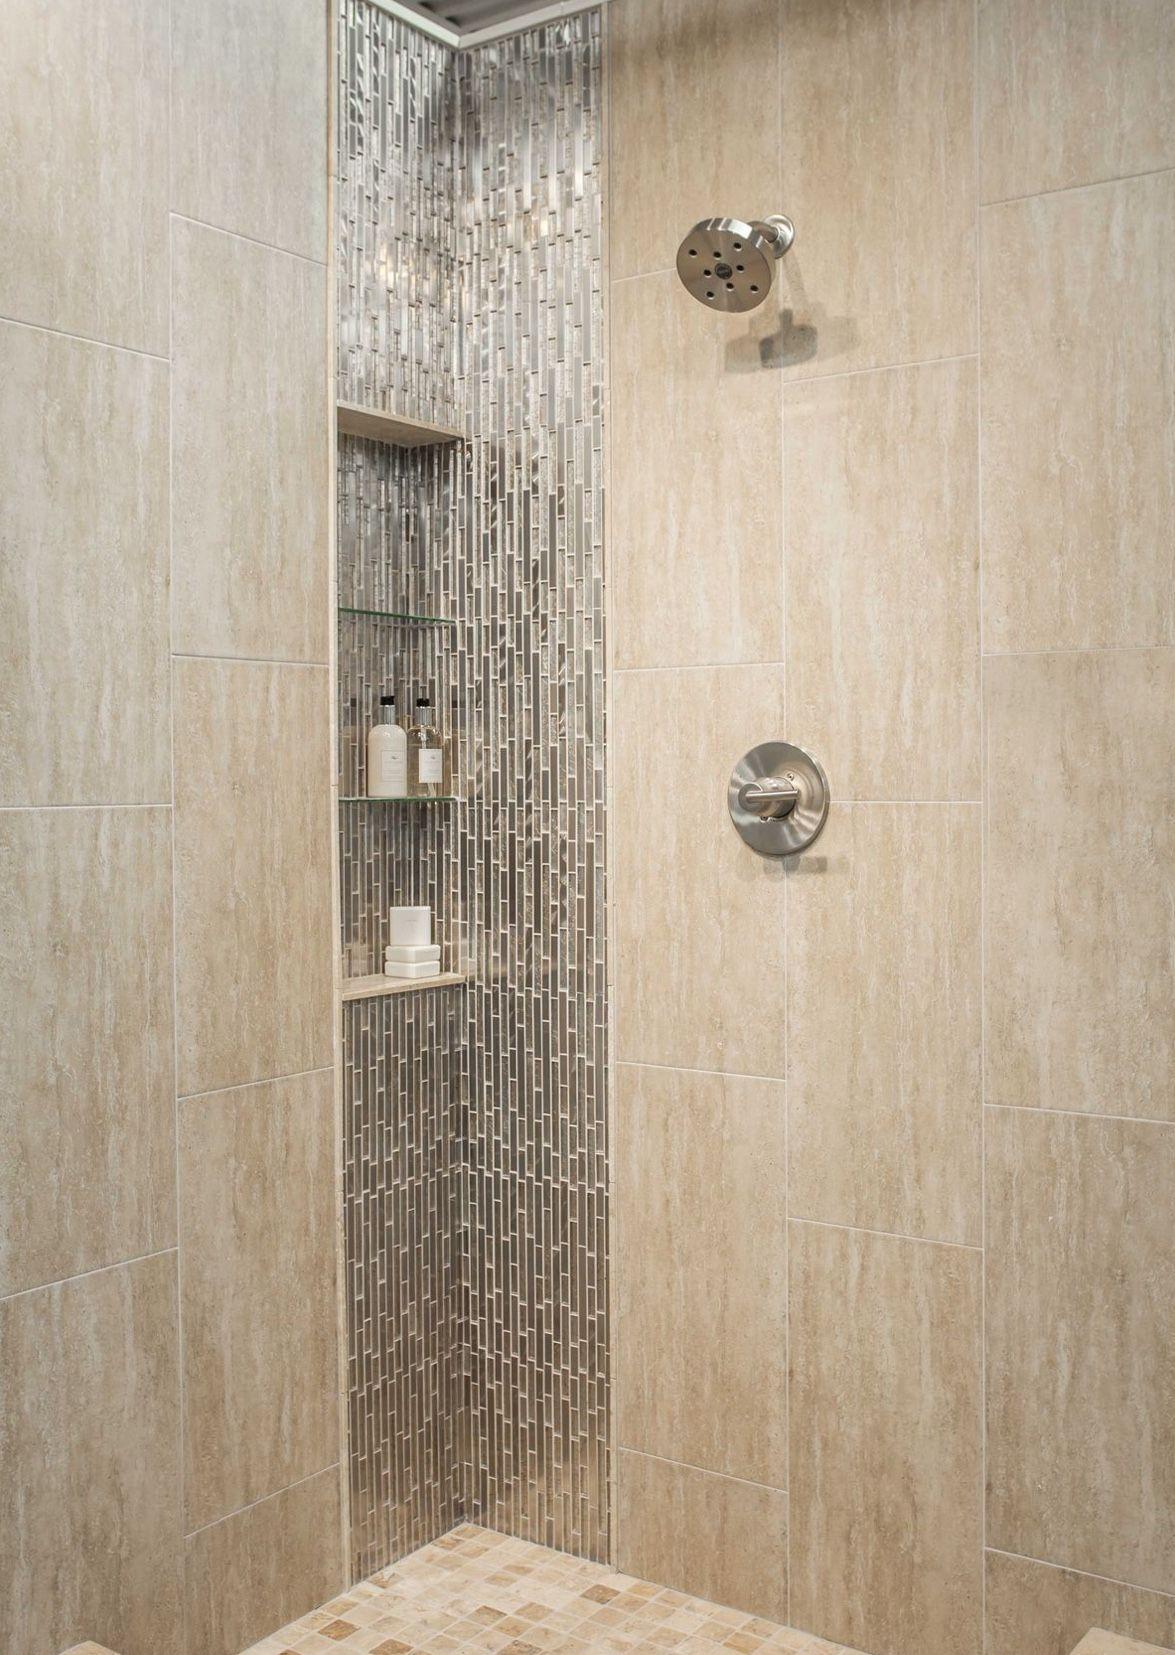 Pin By Meda Olariu On Bathroom Small Bathroom Tiles Shower Remodel Small Bathroom